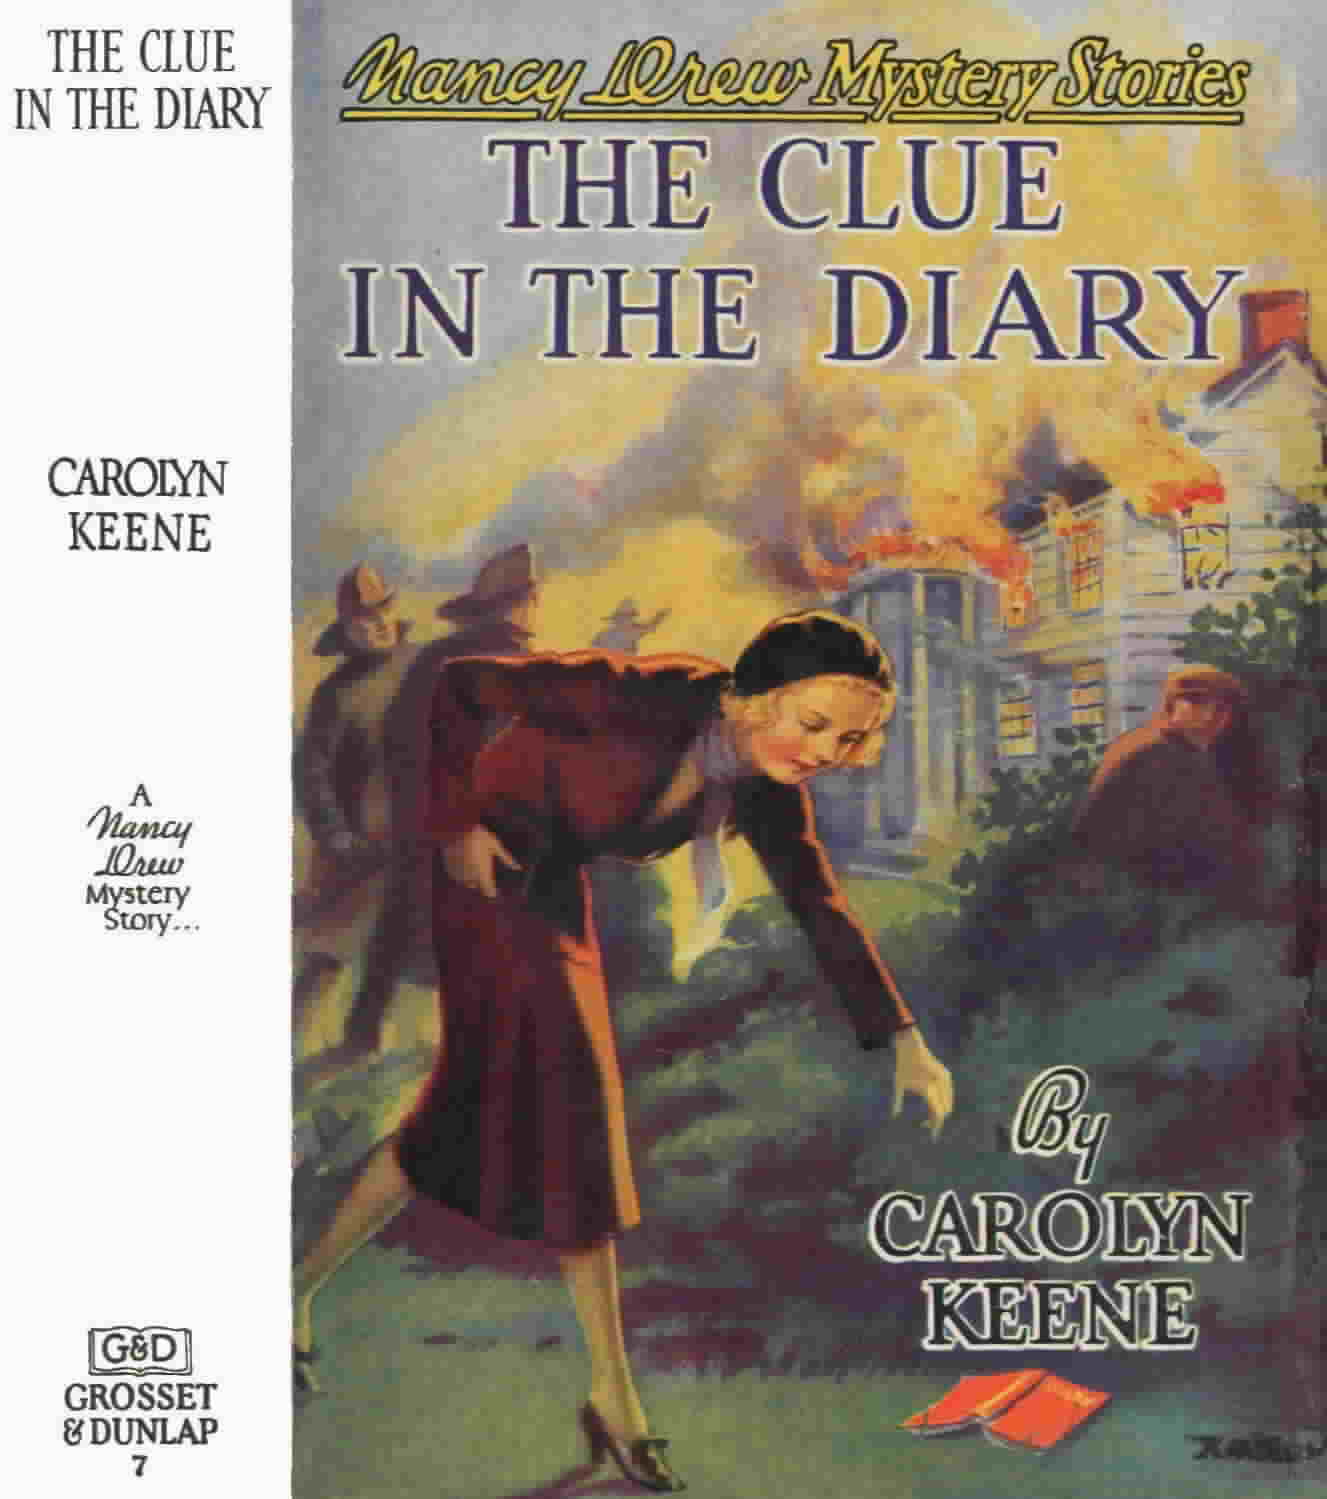 The LiteraryGrrrl: BOOK REVIEW: Nancy Drew Mystery Stories